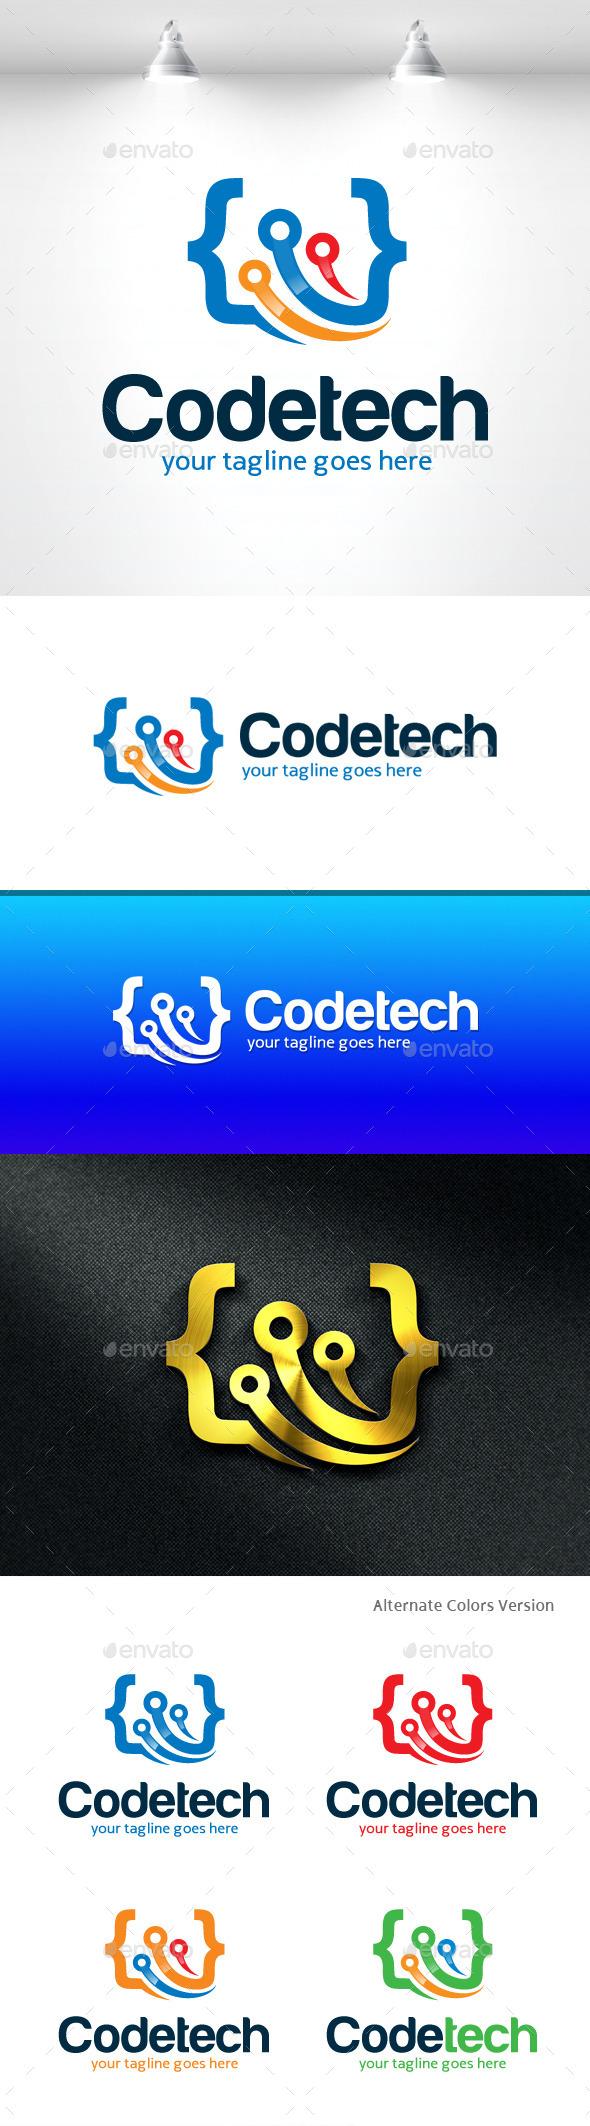 Well designed technology logos